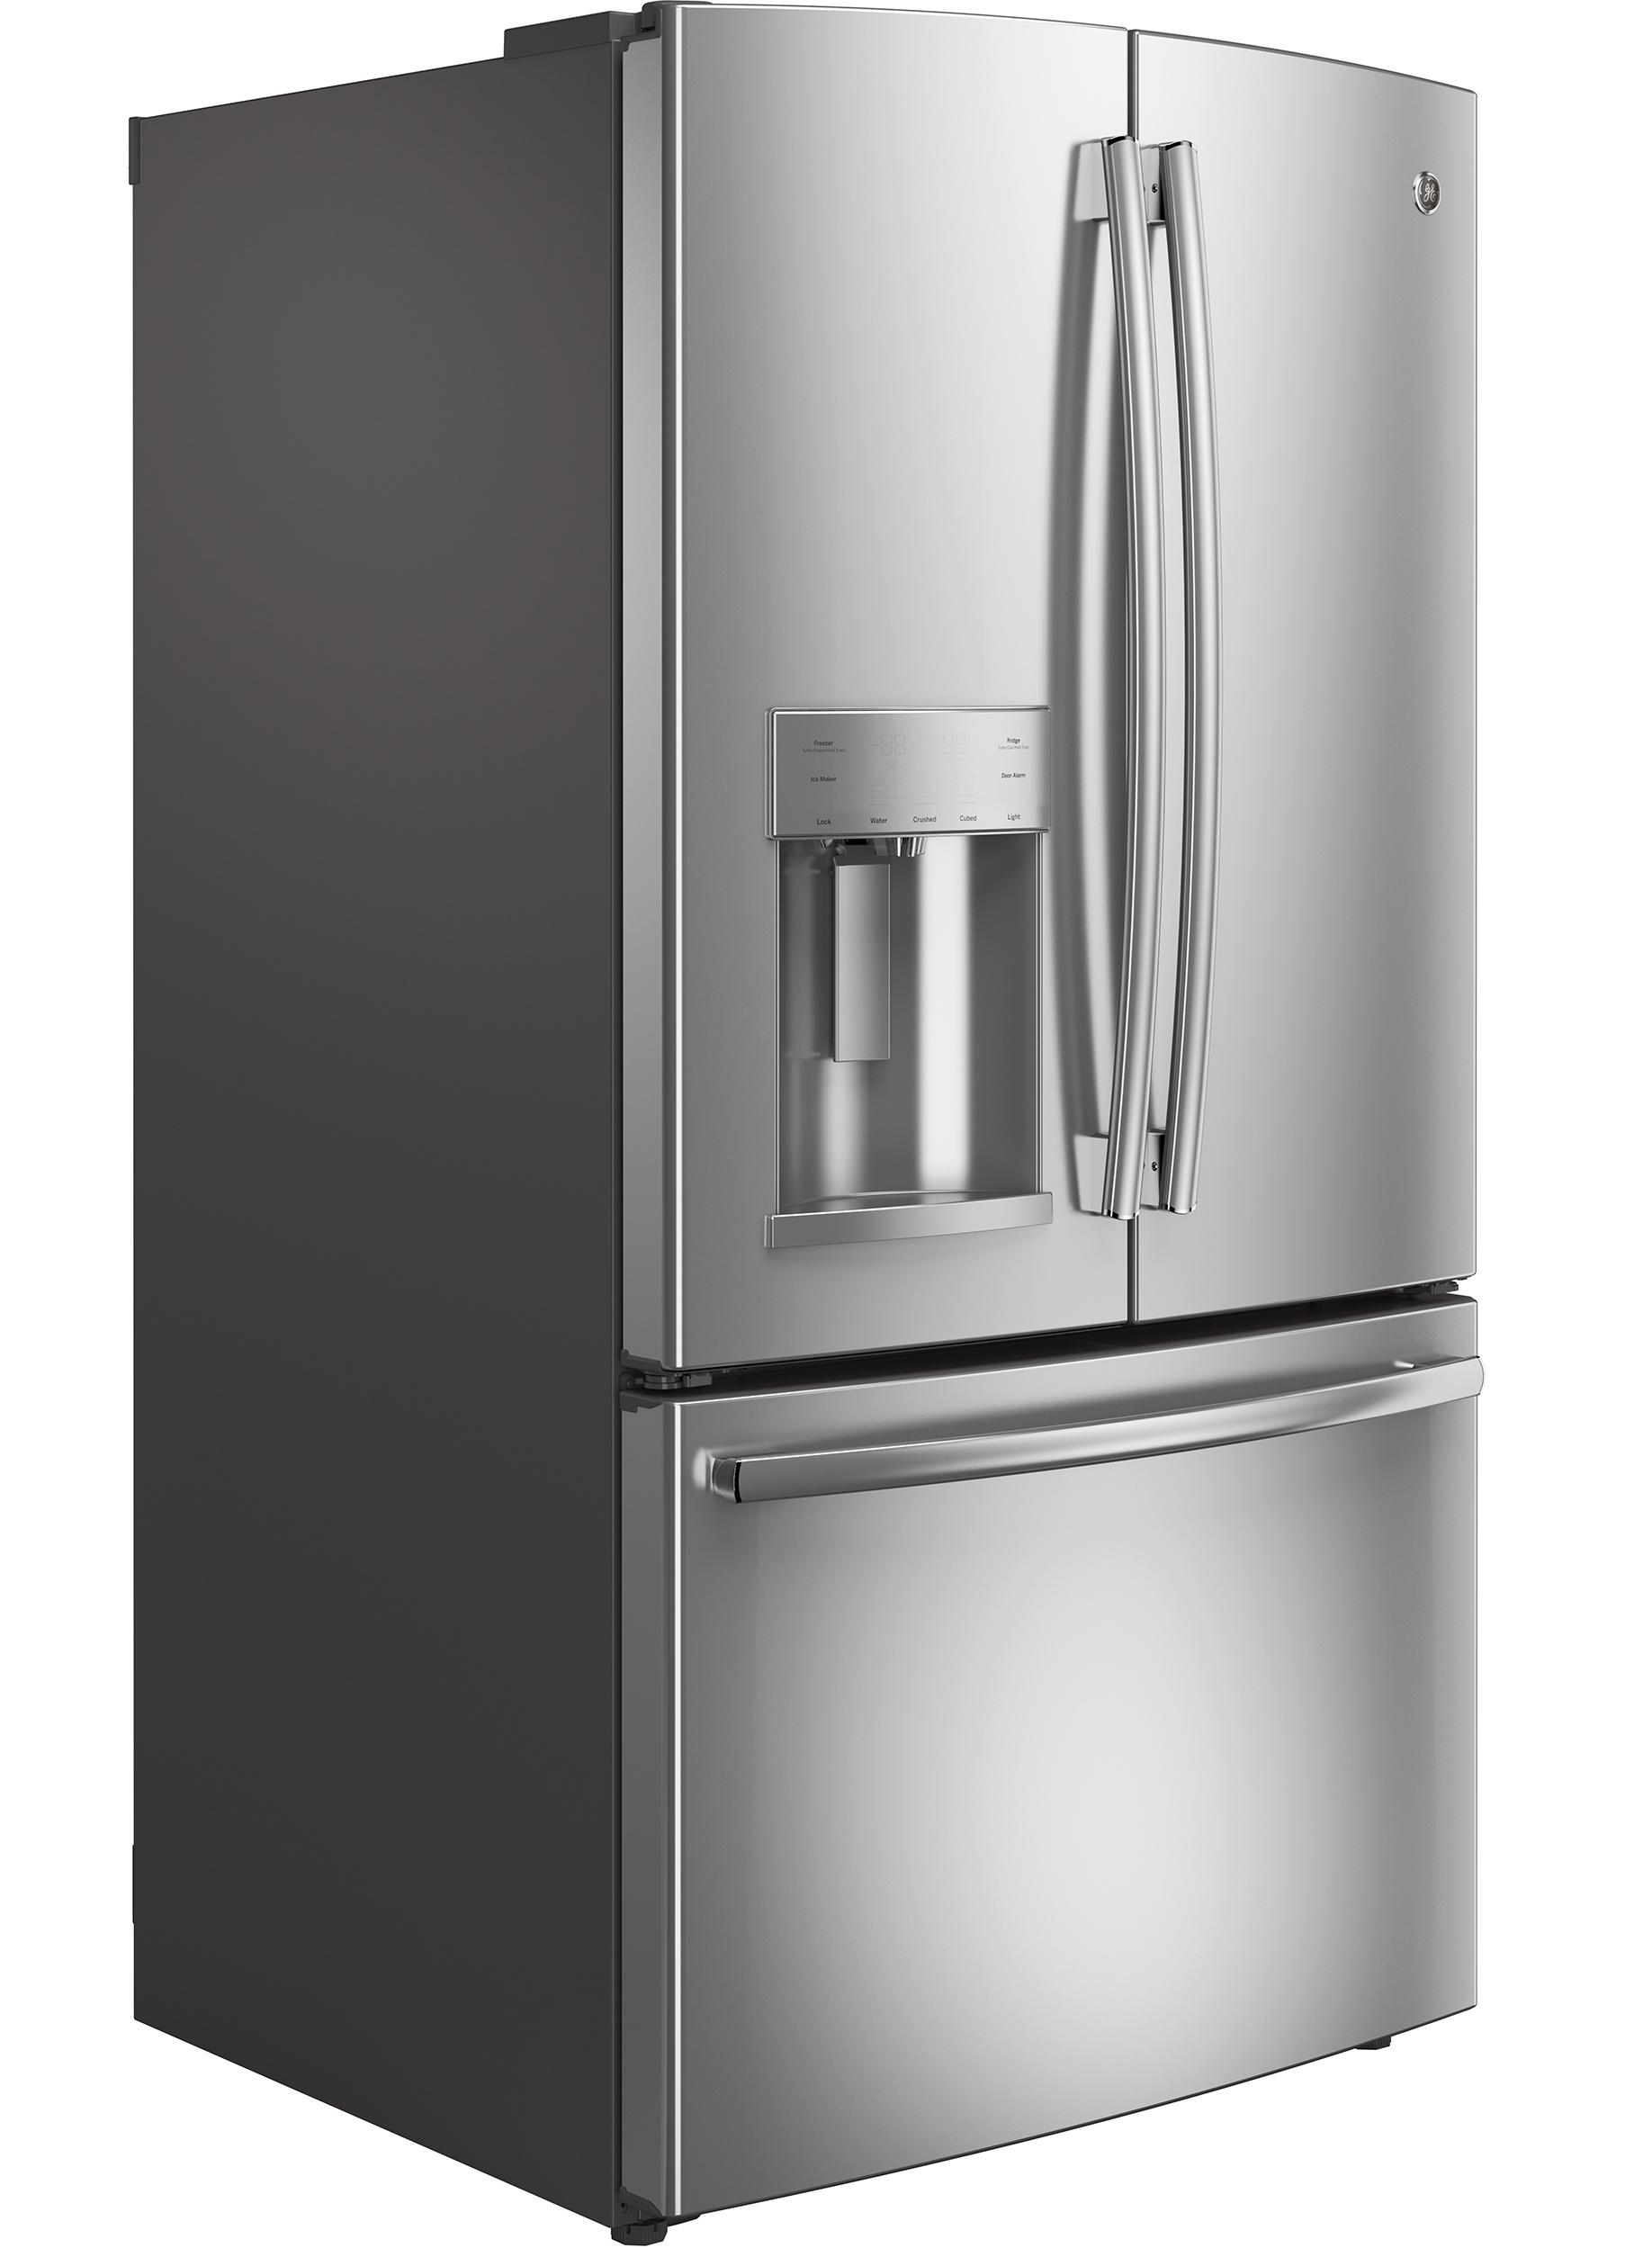 GE Appliances GYE22KSHSS 22.1 cu. ft. Counter-Depth French-Door Refrigerator - Stainless Steel